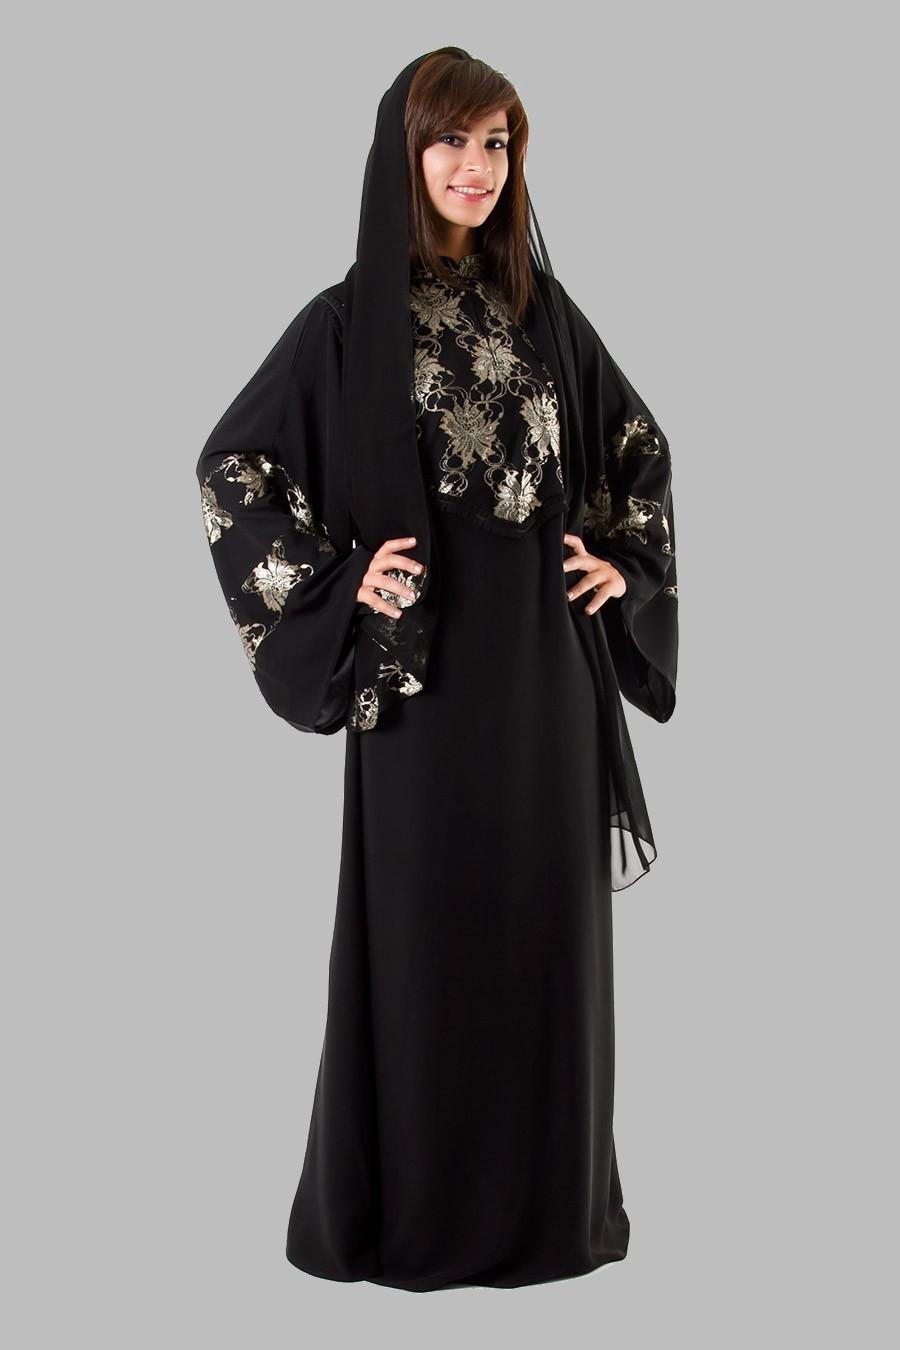 Embroidered Abaya Designs 2013 | Islamic Abaya Dress ...